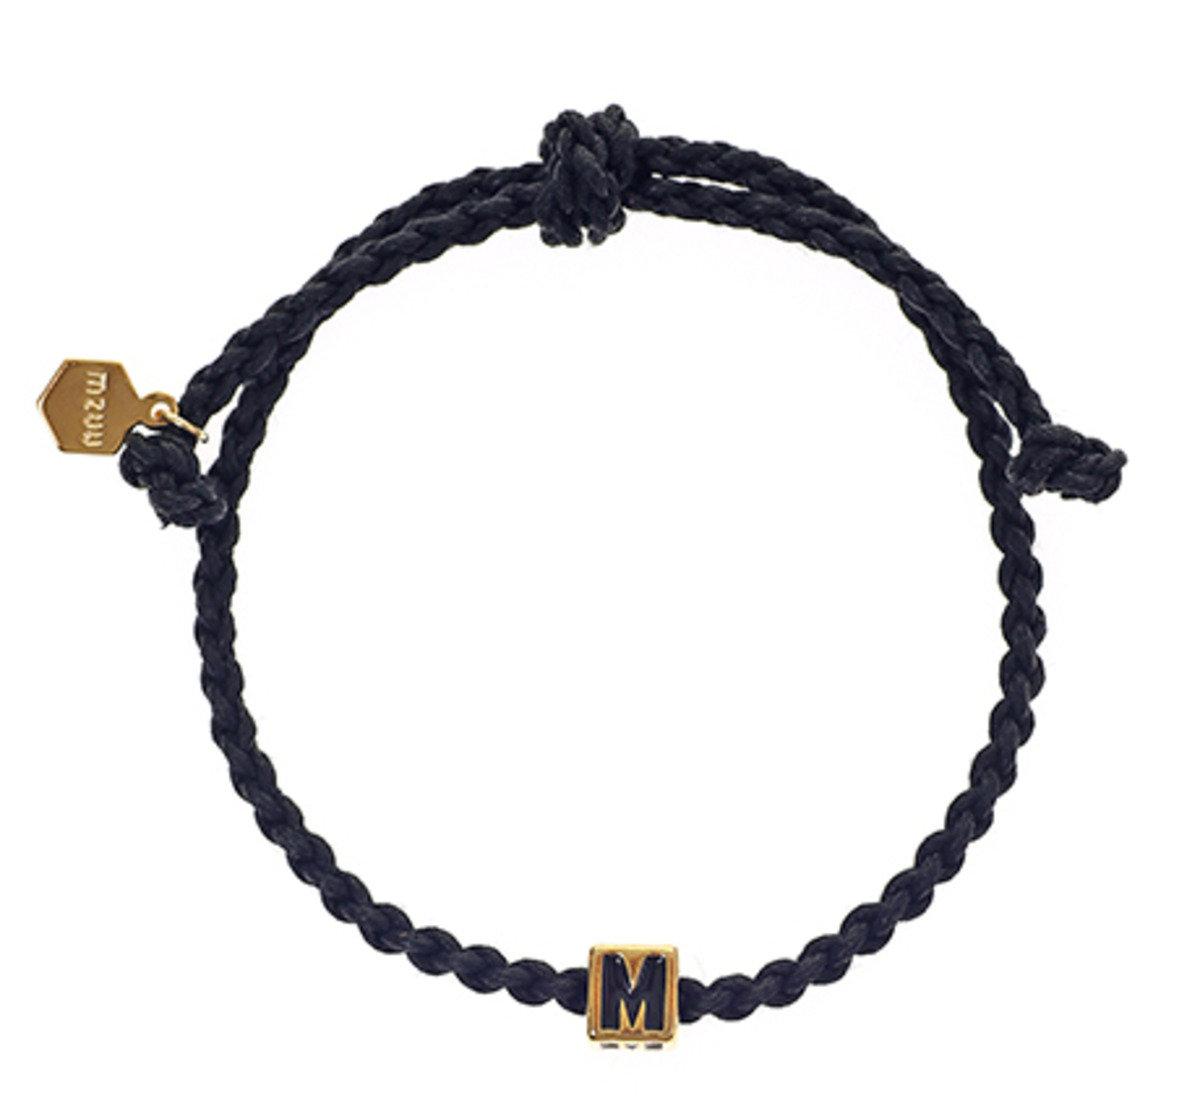 《太陽的後裔》宋仲基同款 ALOHA SOLID 編織手繩 (黑色)